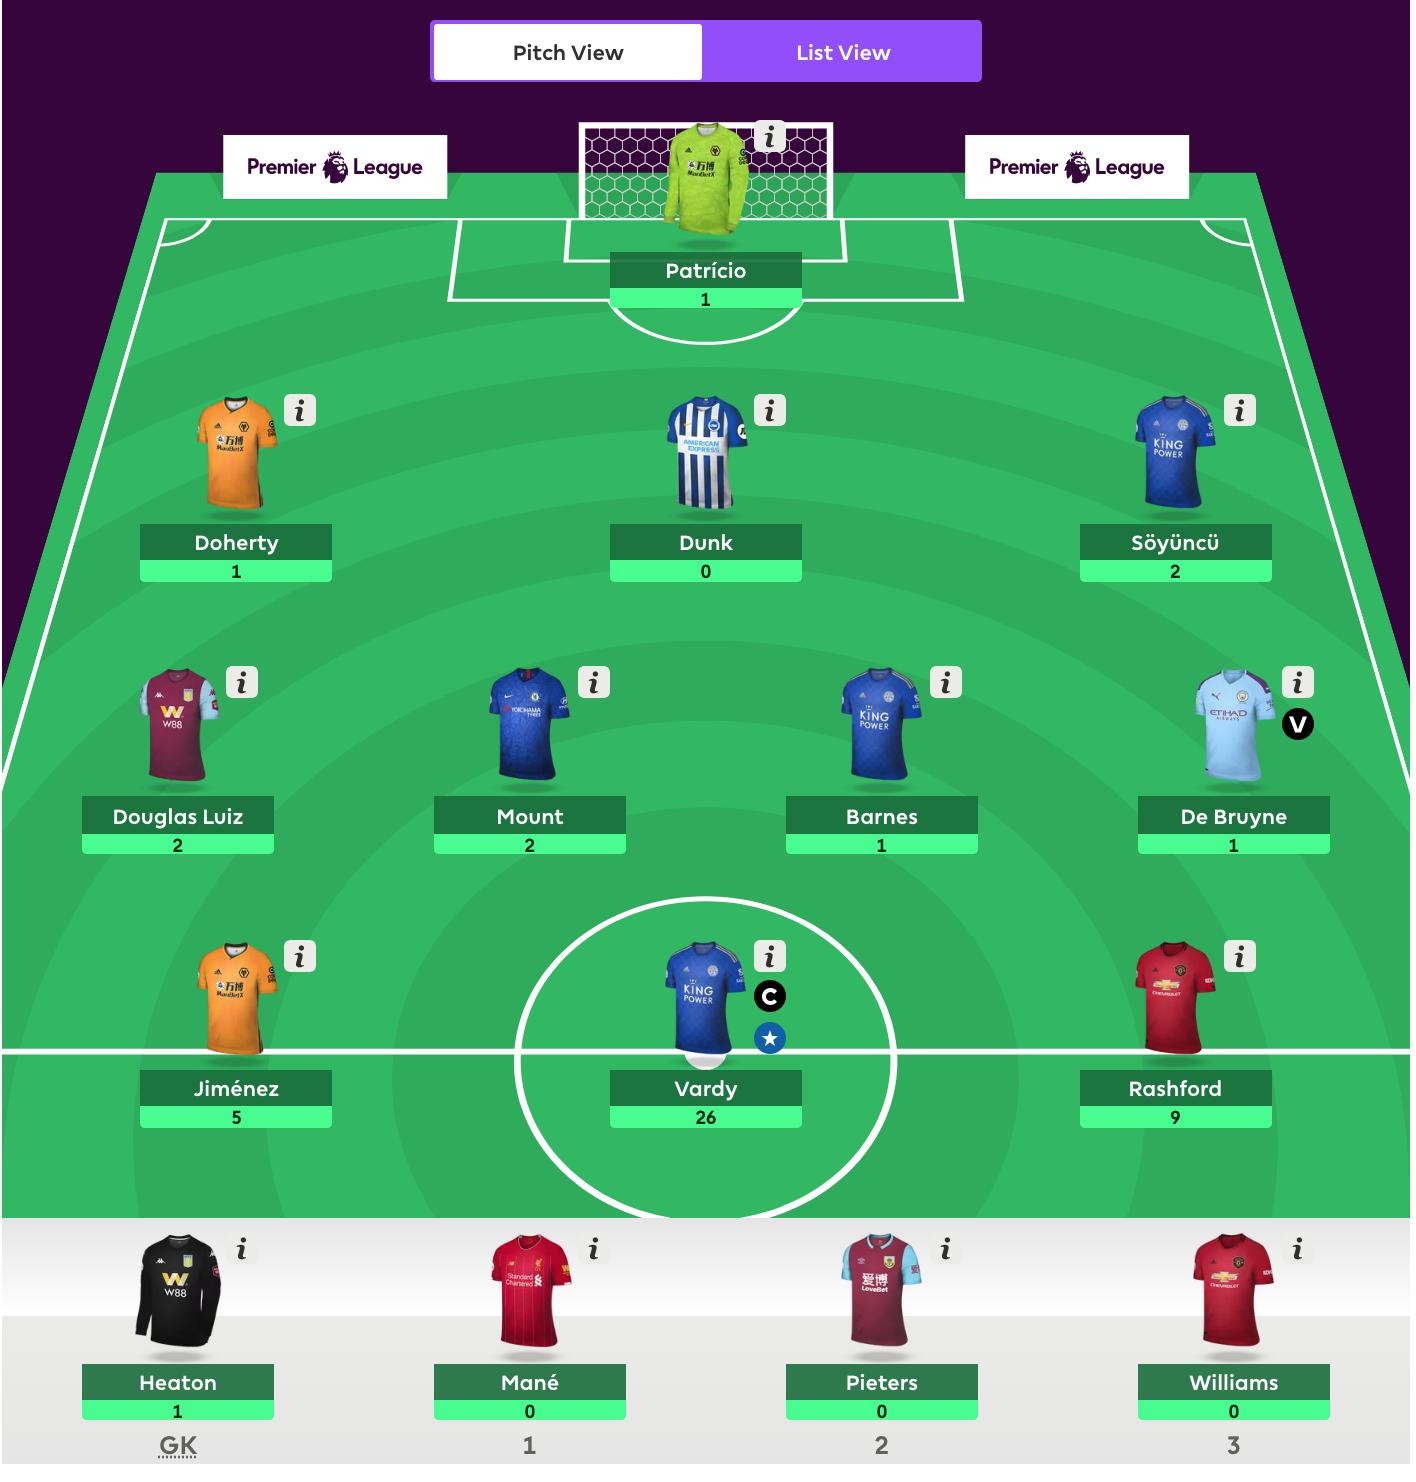 Fantasy Premier League 2019 - 2020 viikko 16